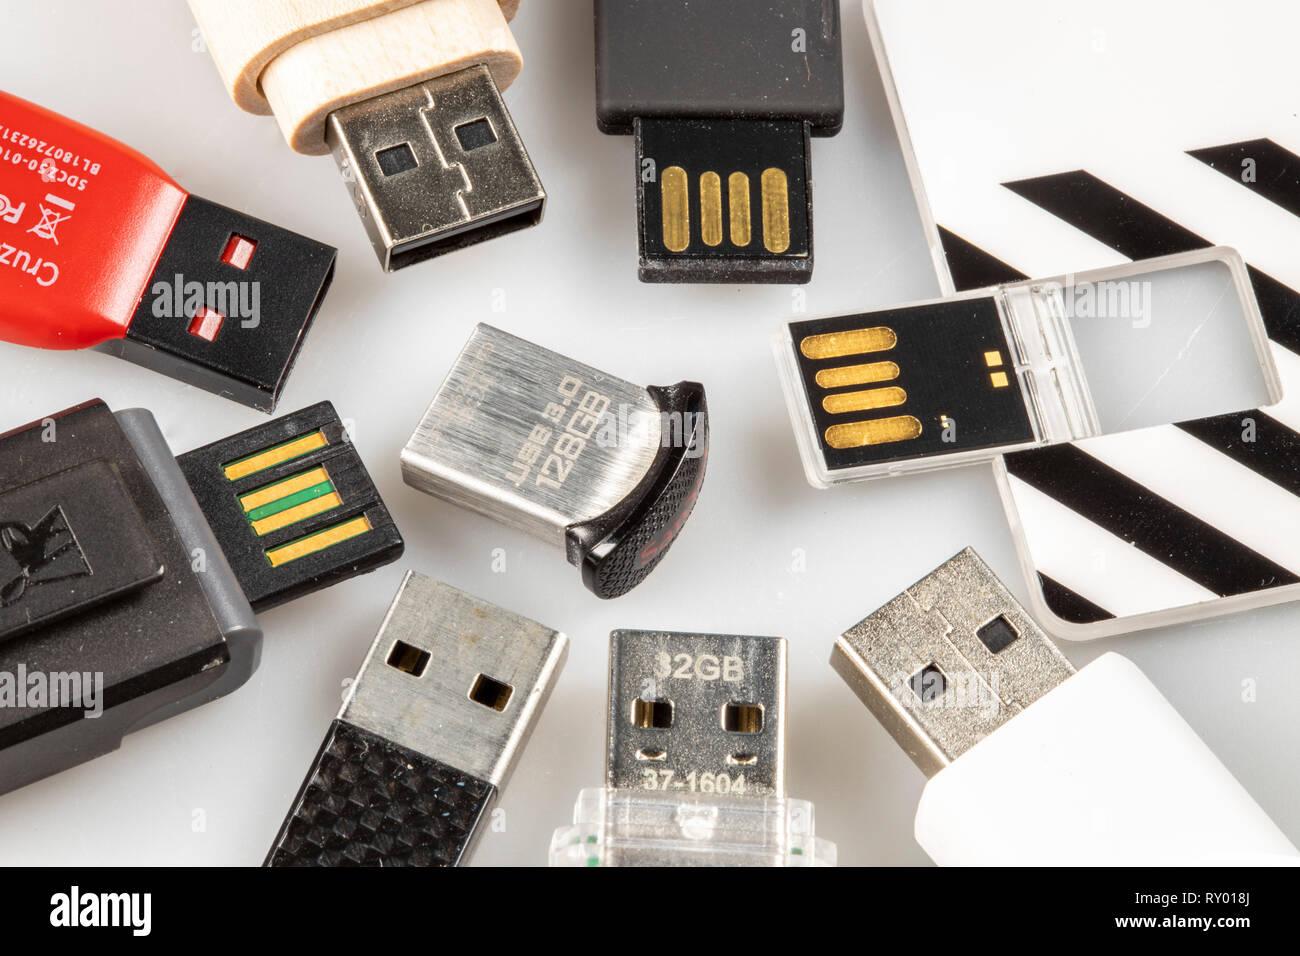 USB memory sticks, various types, sizes, designs, advertising materials, - Stock Image